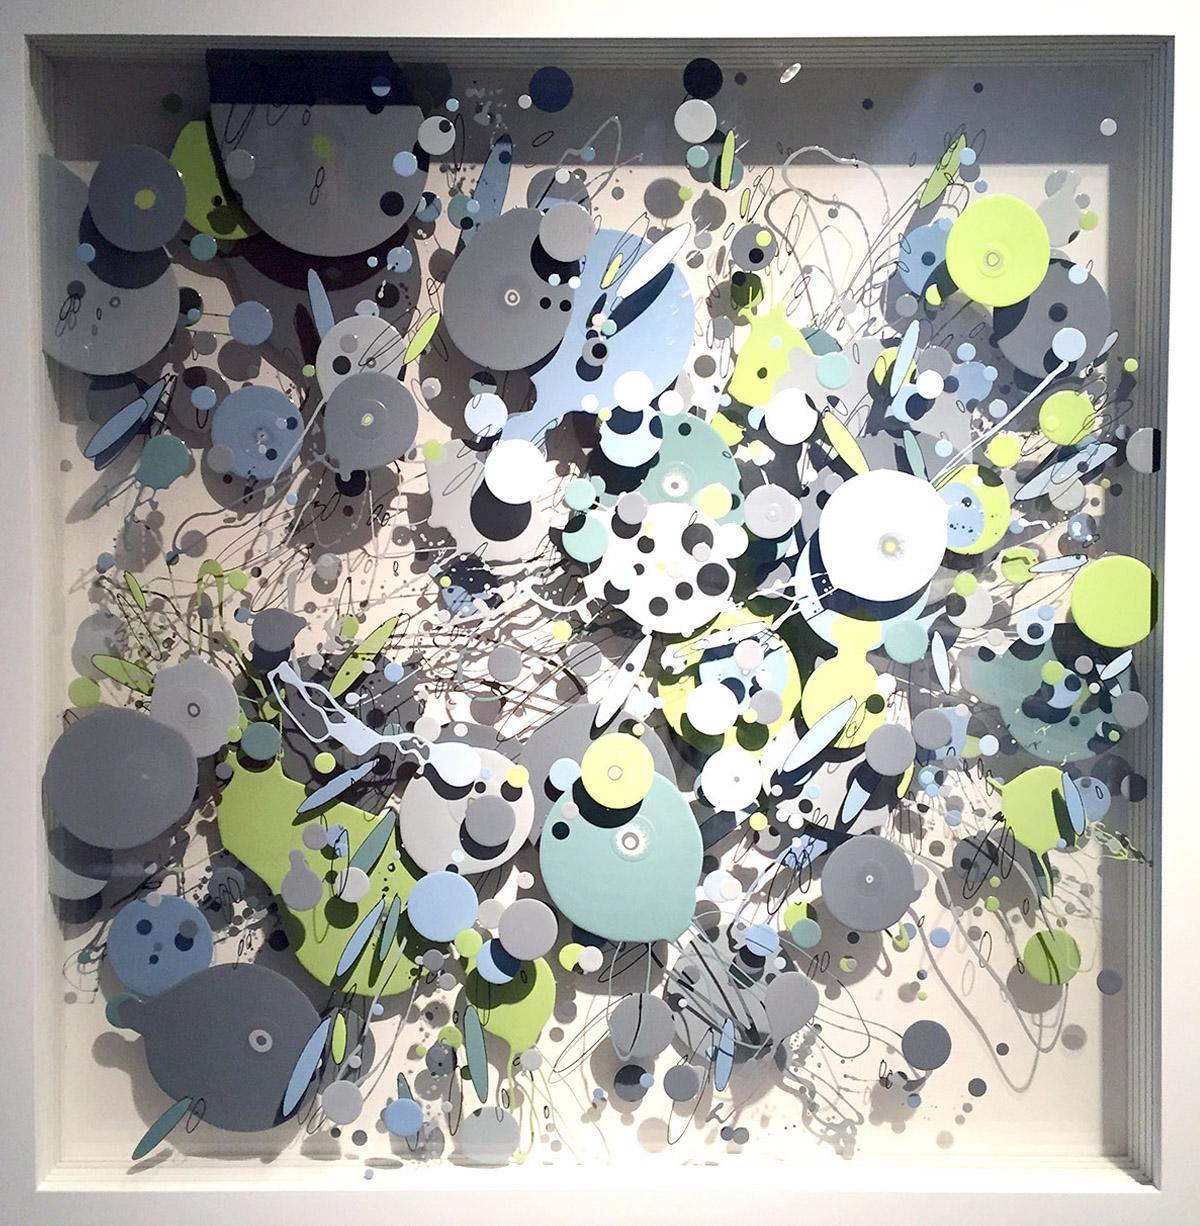 CP007 (diptych left) enamel acrylic on layered plexiglas 36 x 36 x 3.5 inches WGR 047G